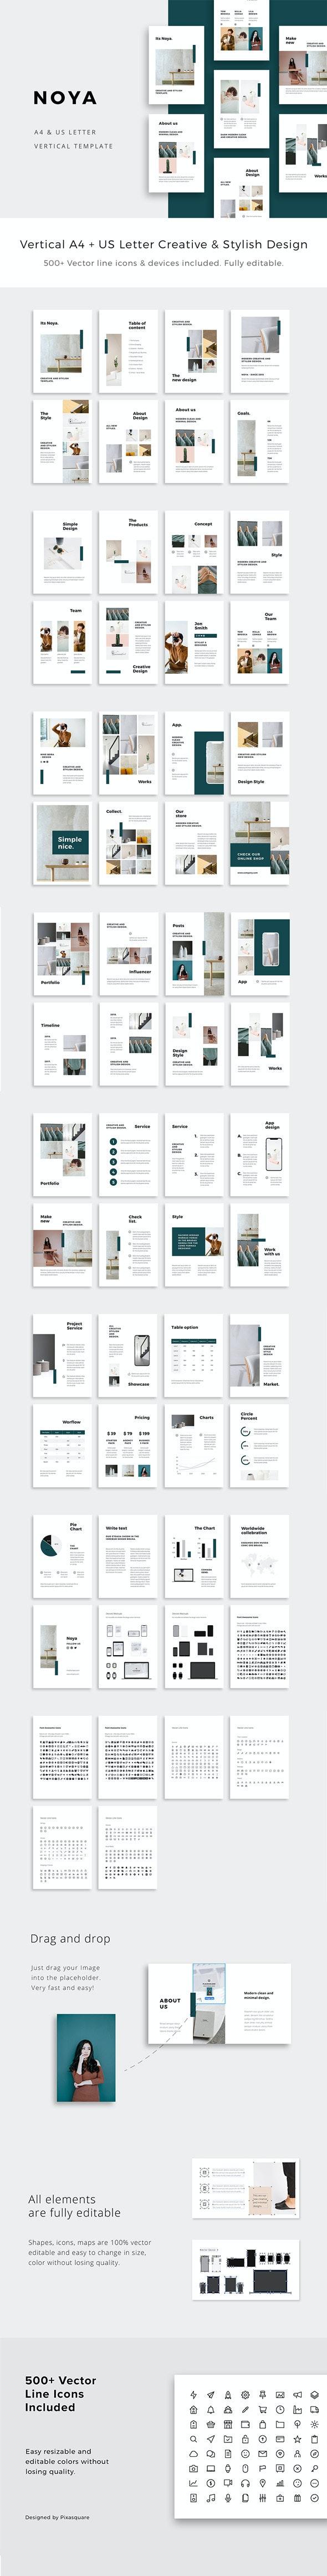 NOYA - Vertical Keynote Presentation Template - Creative Keynote Templates